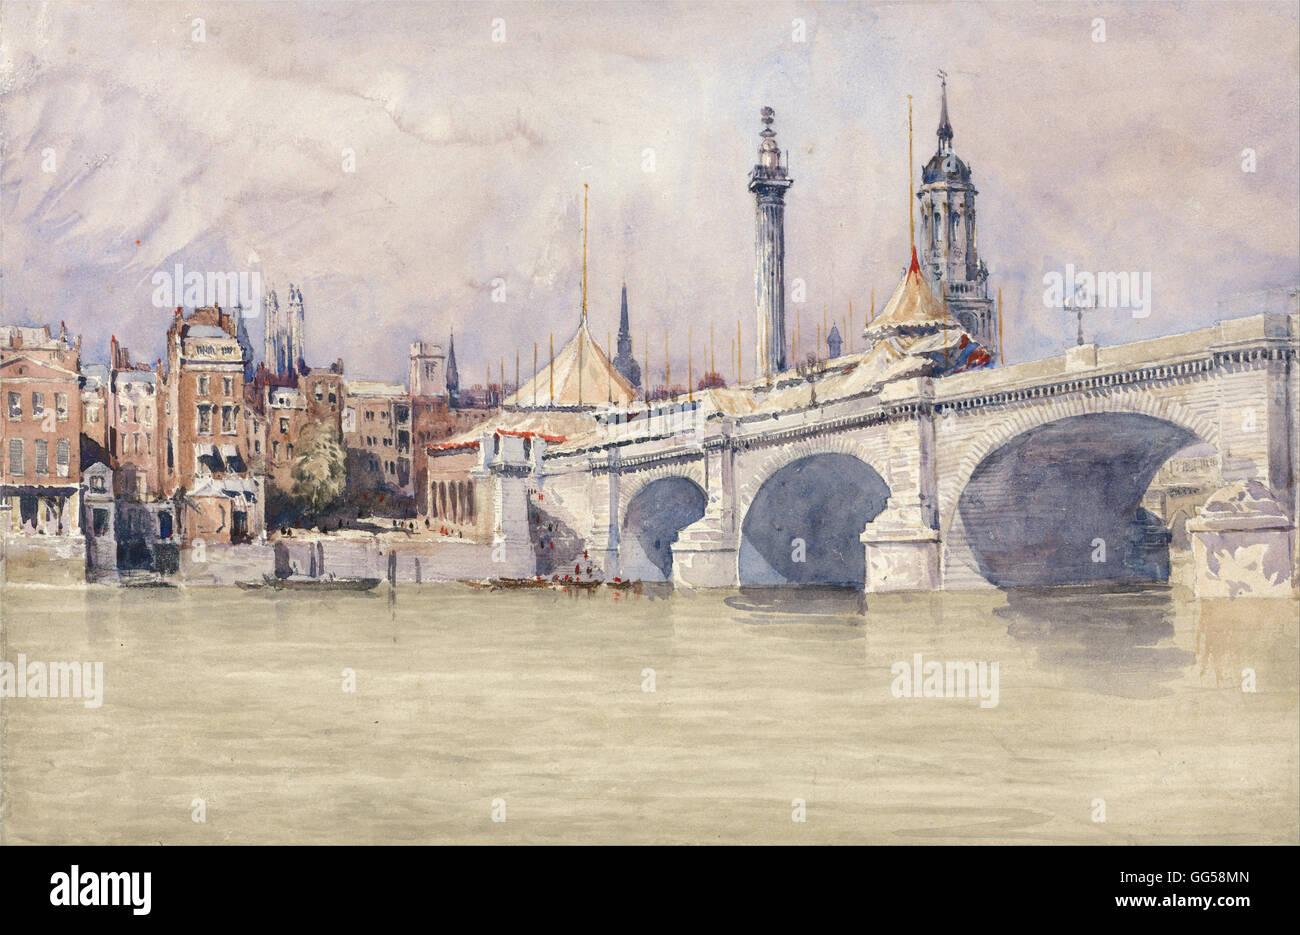 David Cox - The Opening of the New London Bridge - Stock Image